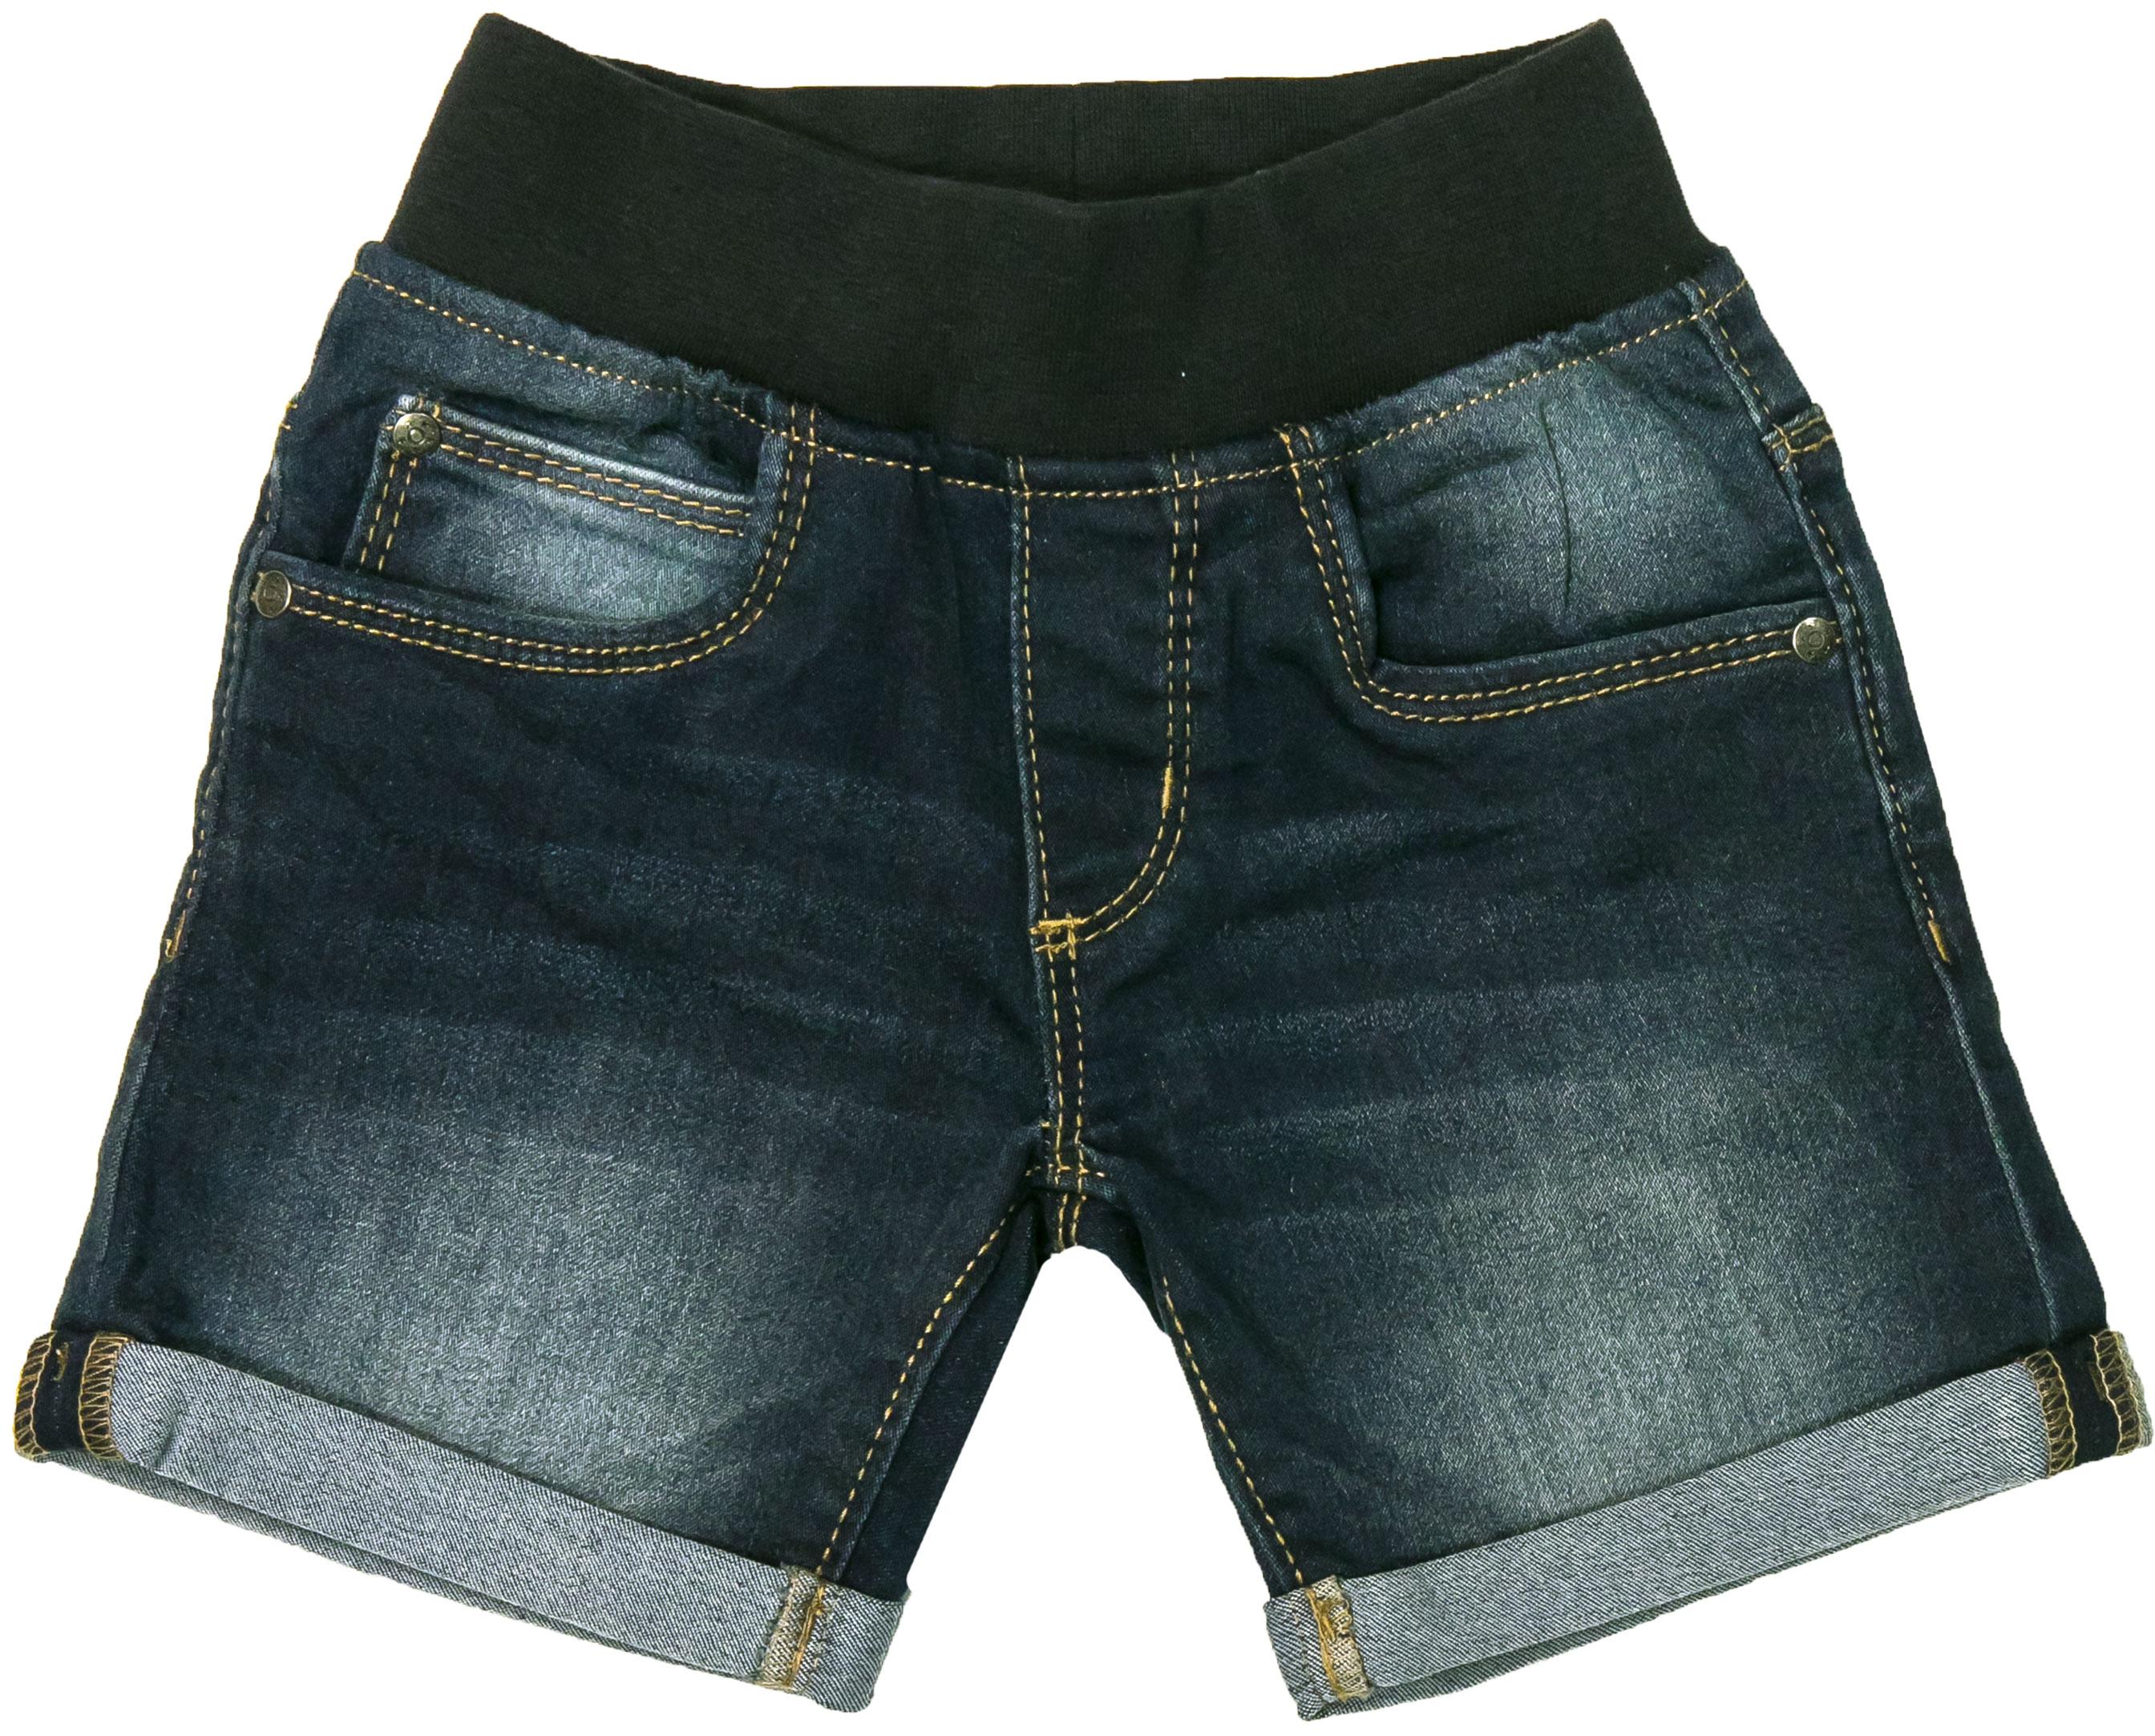 Шорты Barkito Лето на пляже 944009 X570 75 шорты barkito шорты джинсовые для мальчика barkito супергерой голубые